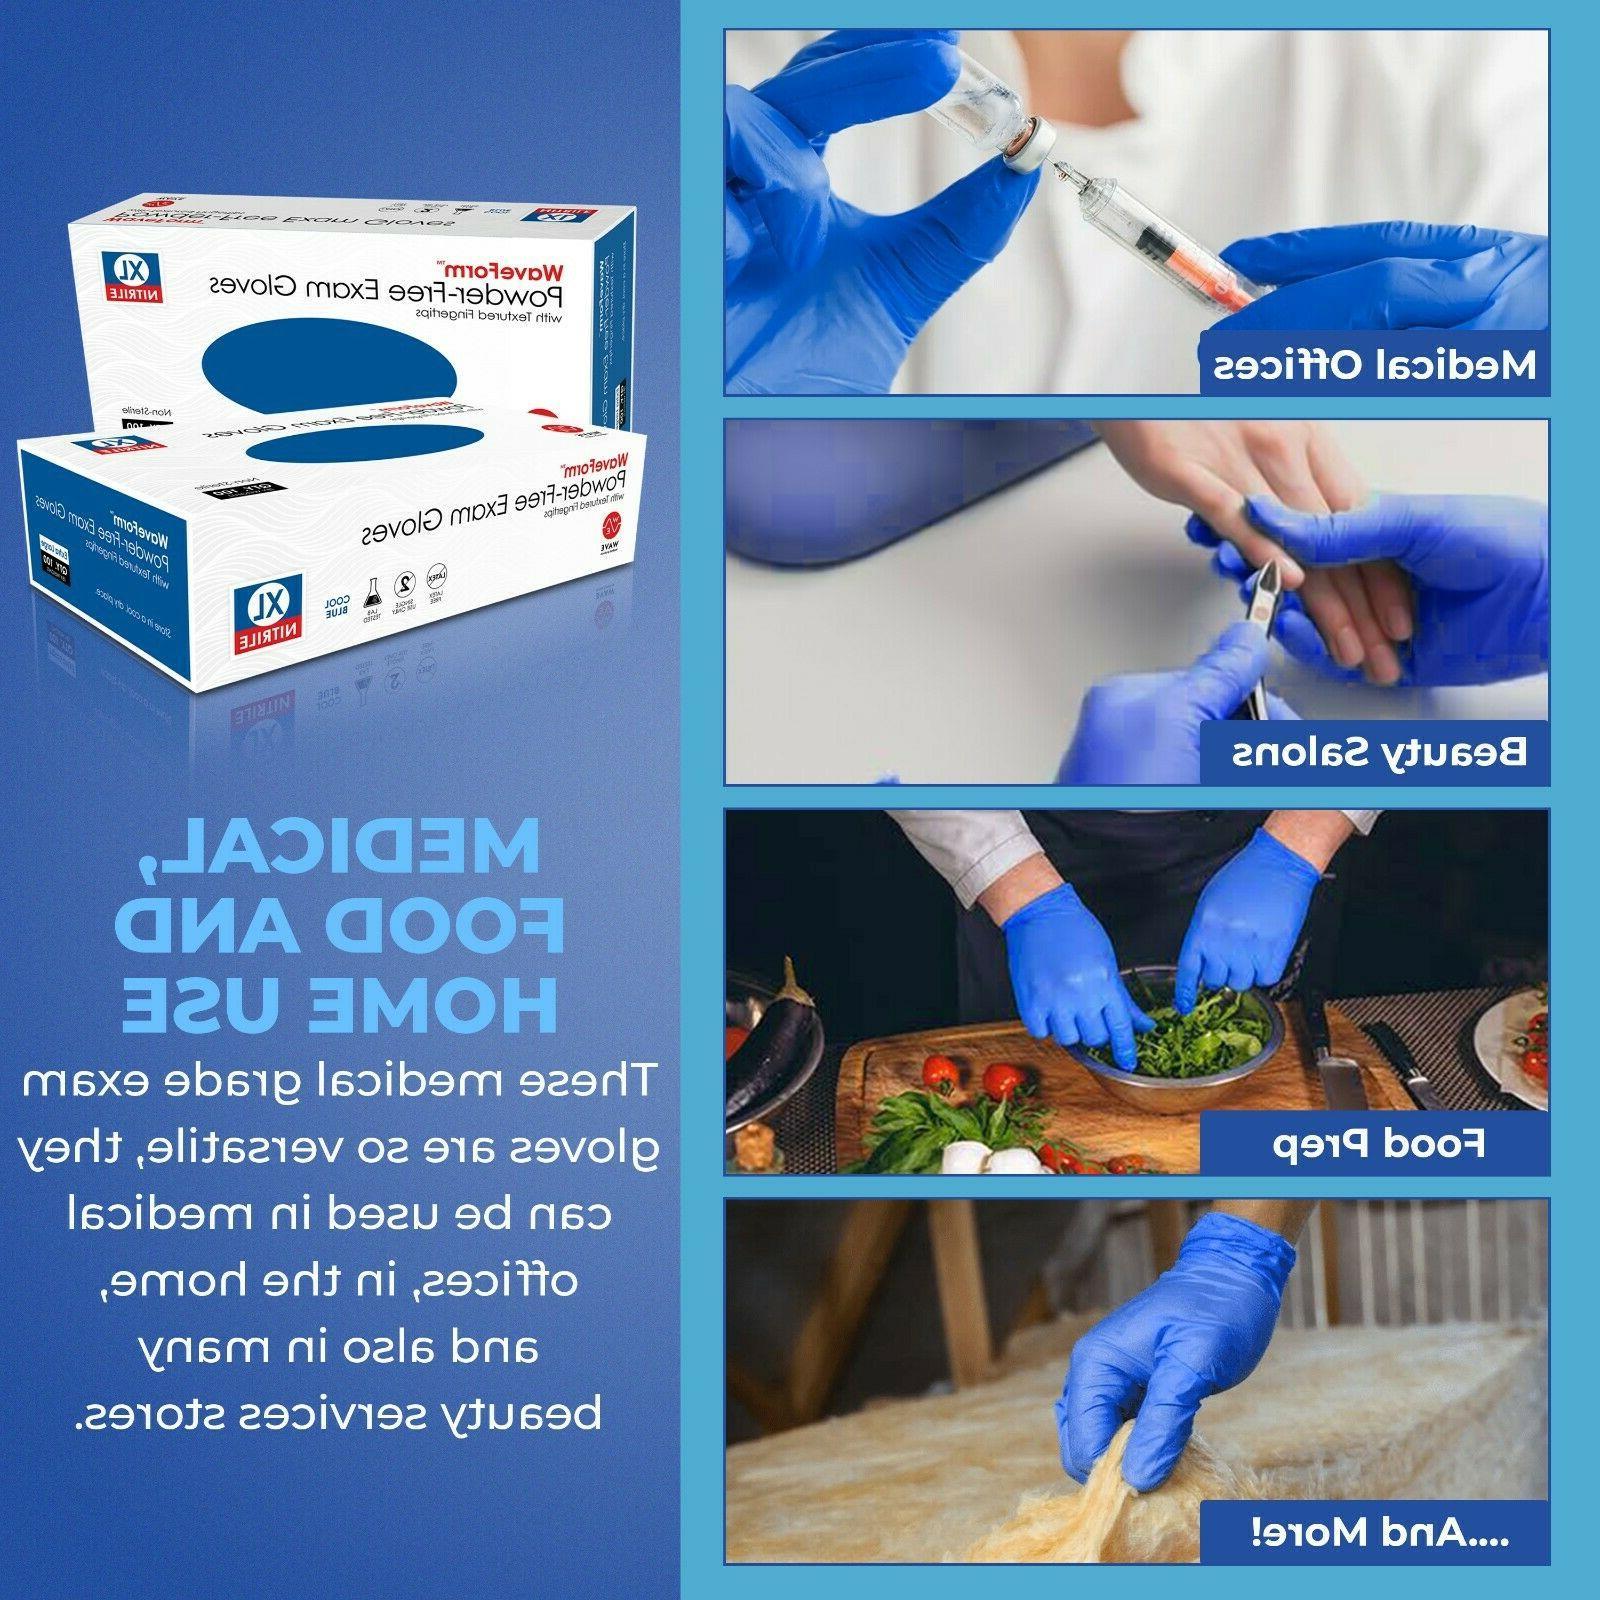 Premium Medical Latex Disposable Gloves